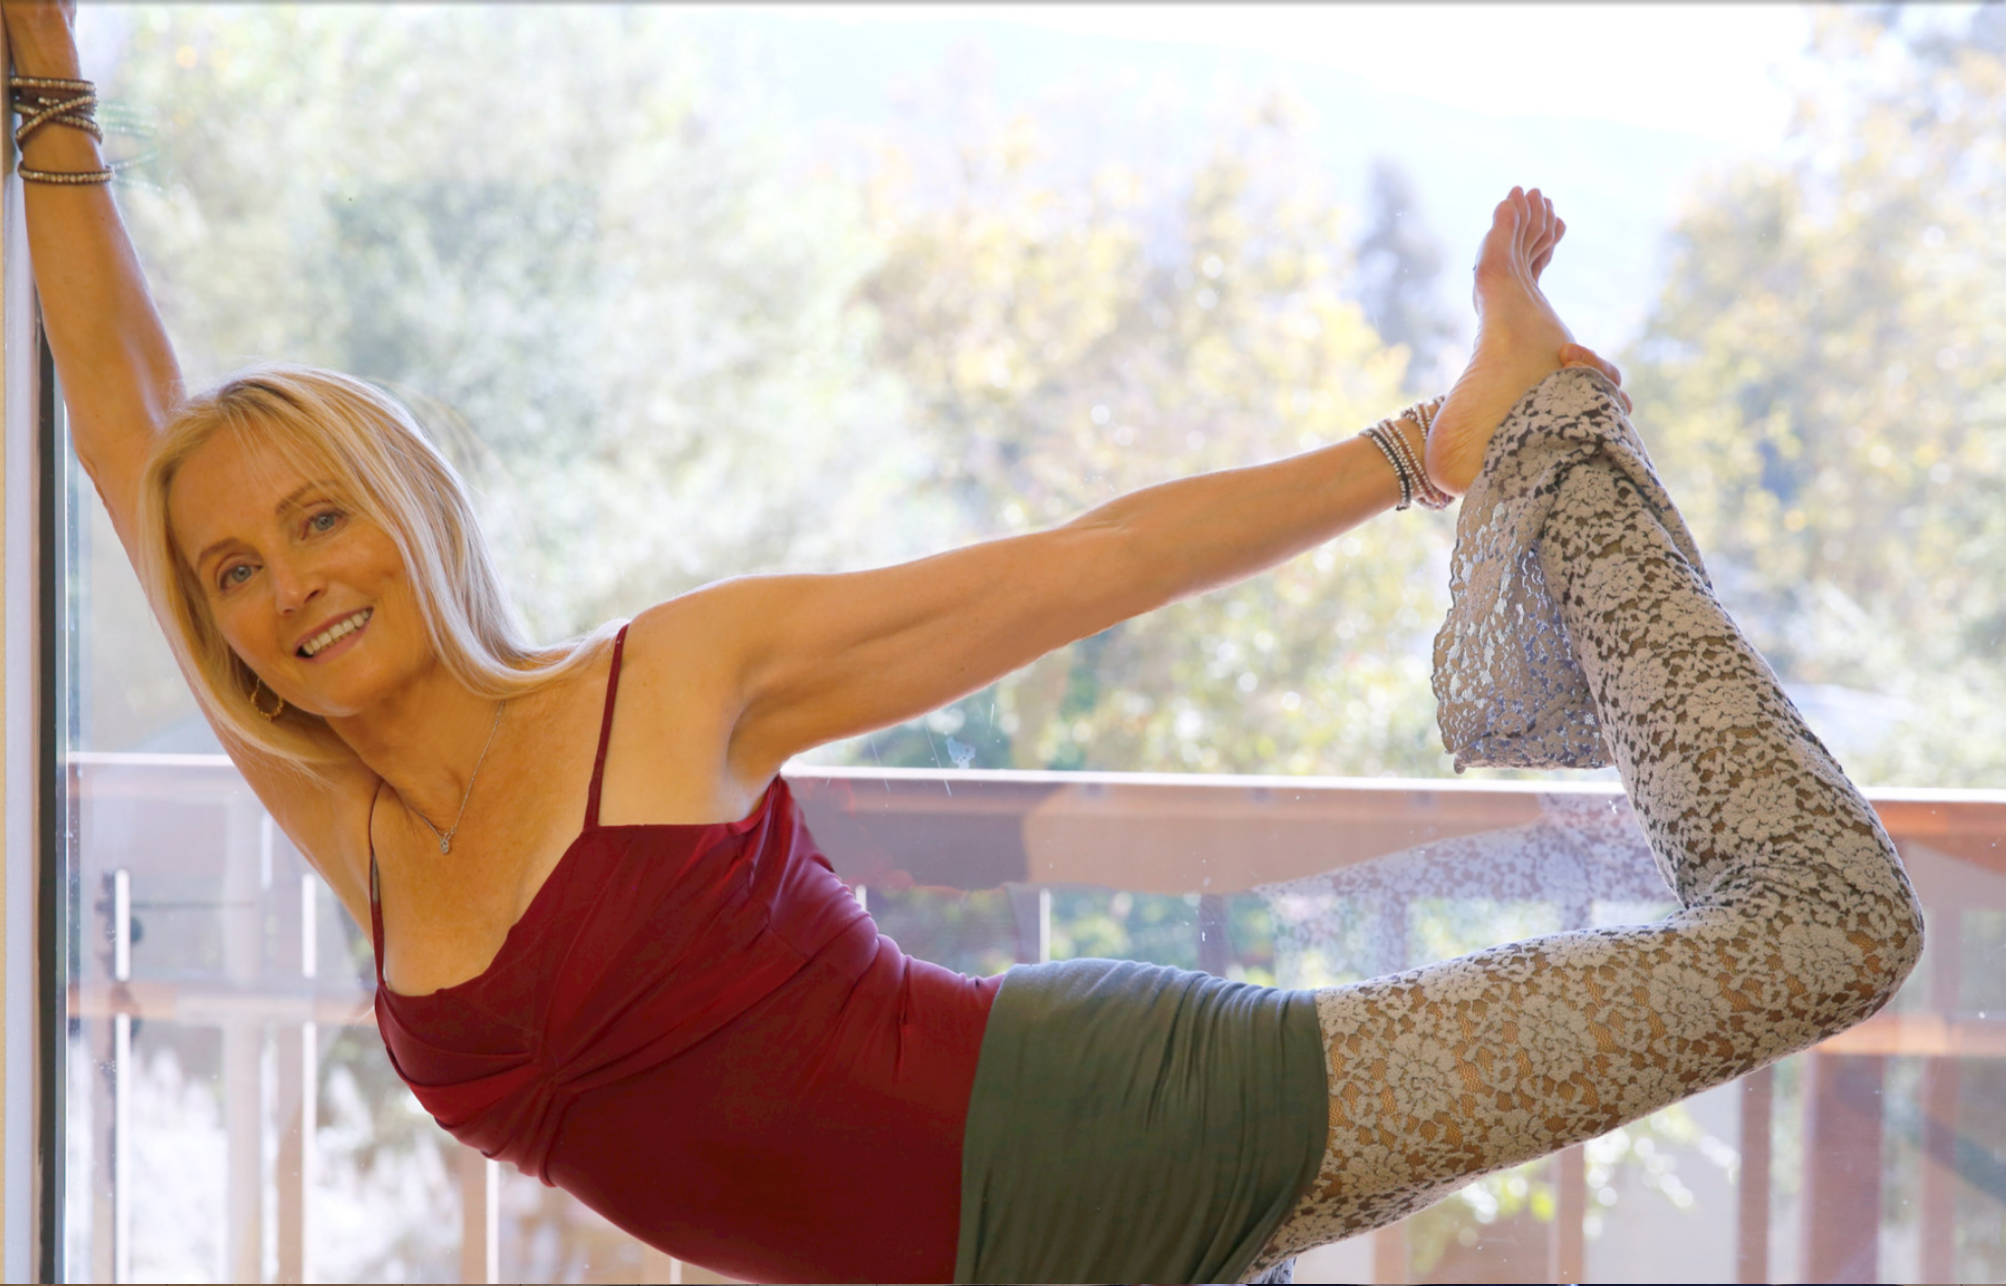 Ingrid today at her yoga studio in Ojai.